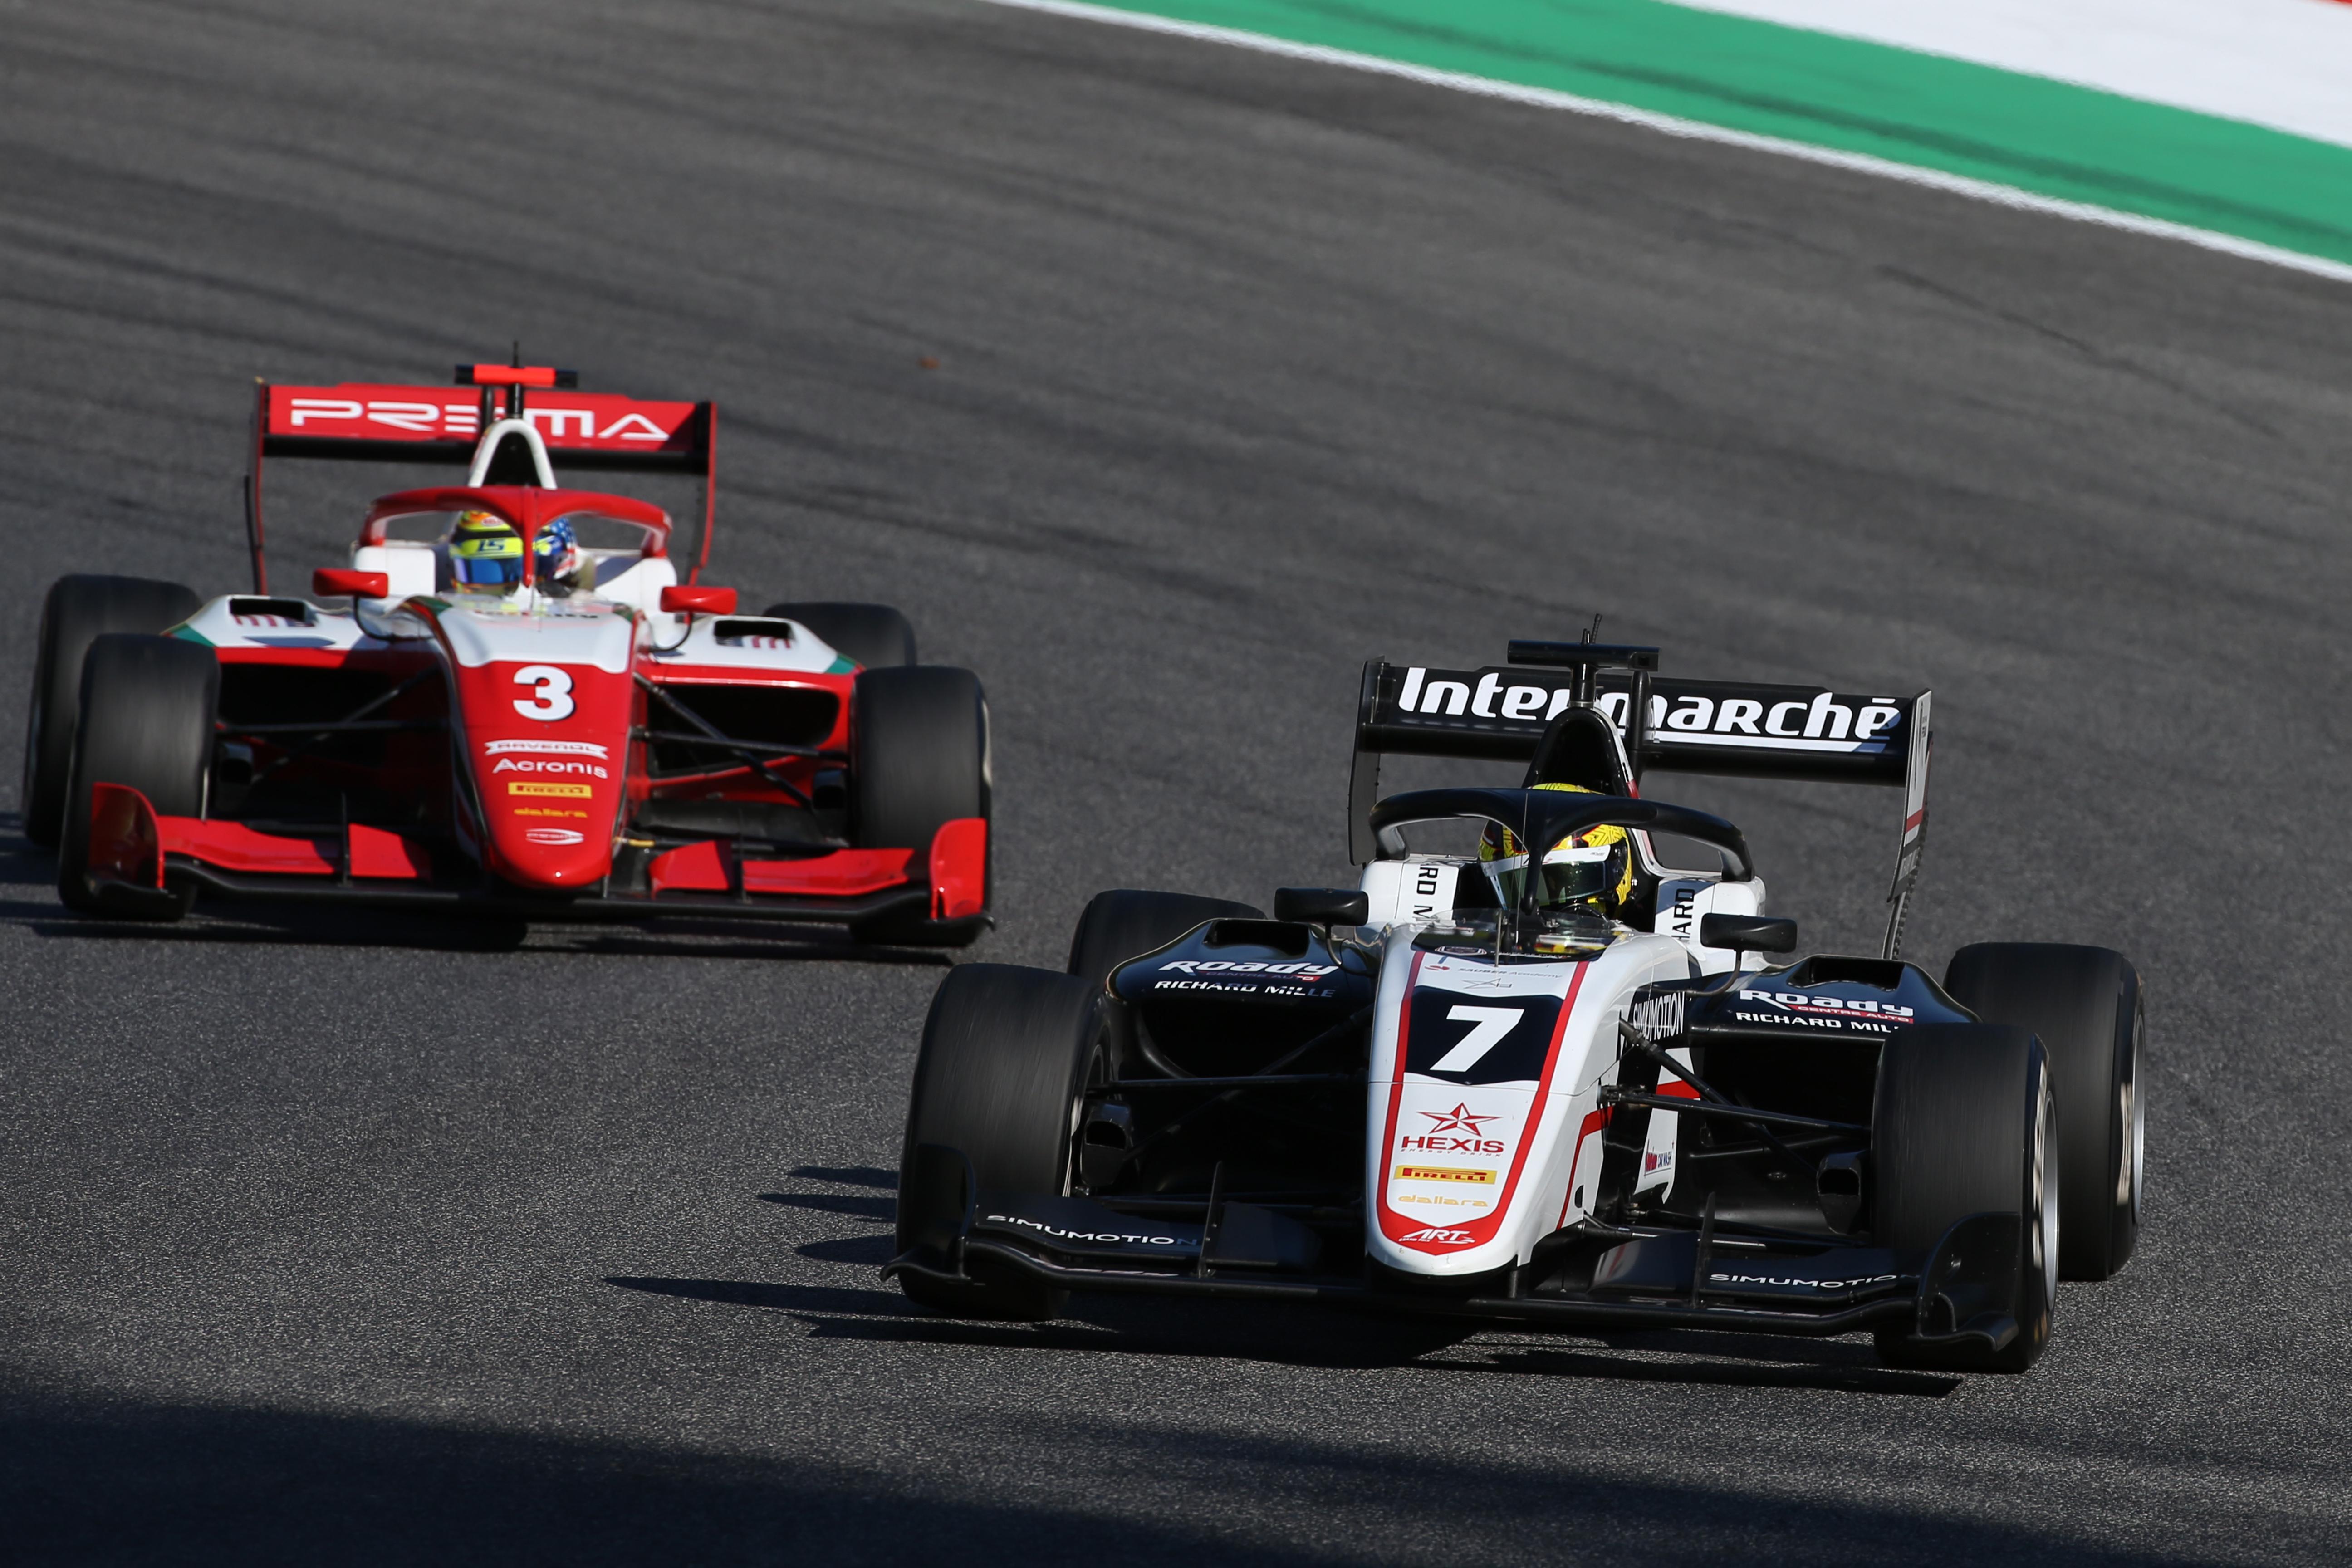 Motor Racing Fia Formula 3 Championship Saturday Mugello, Italy